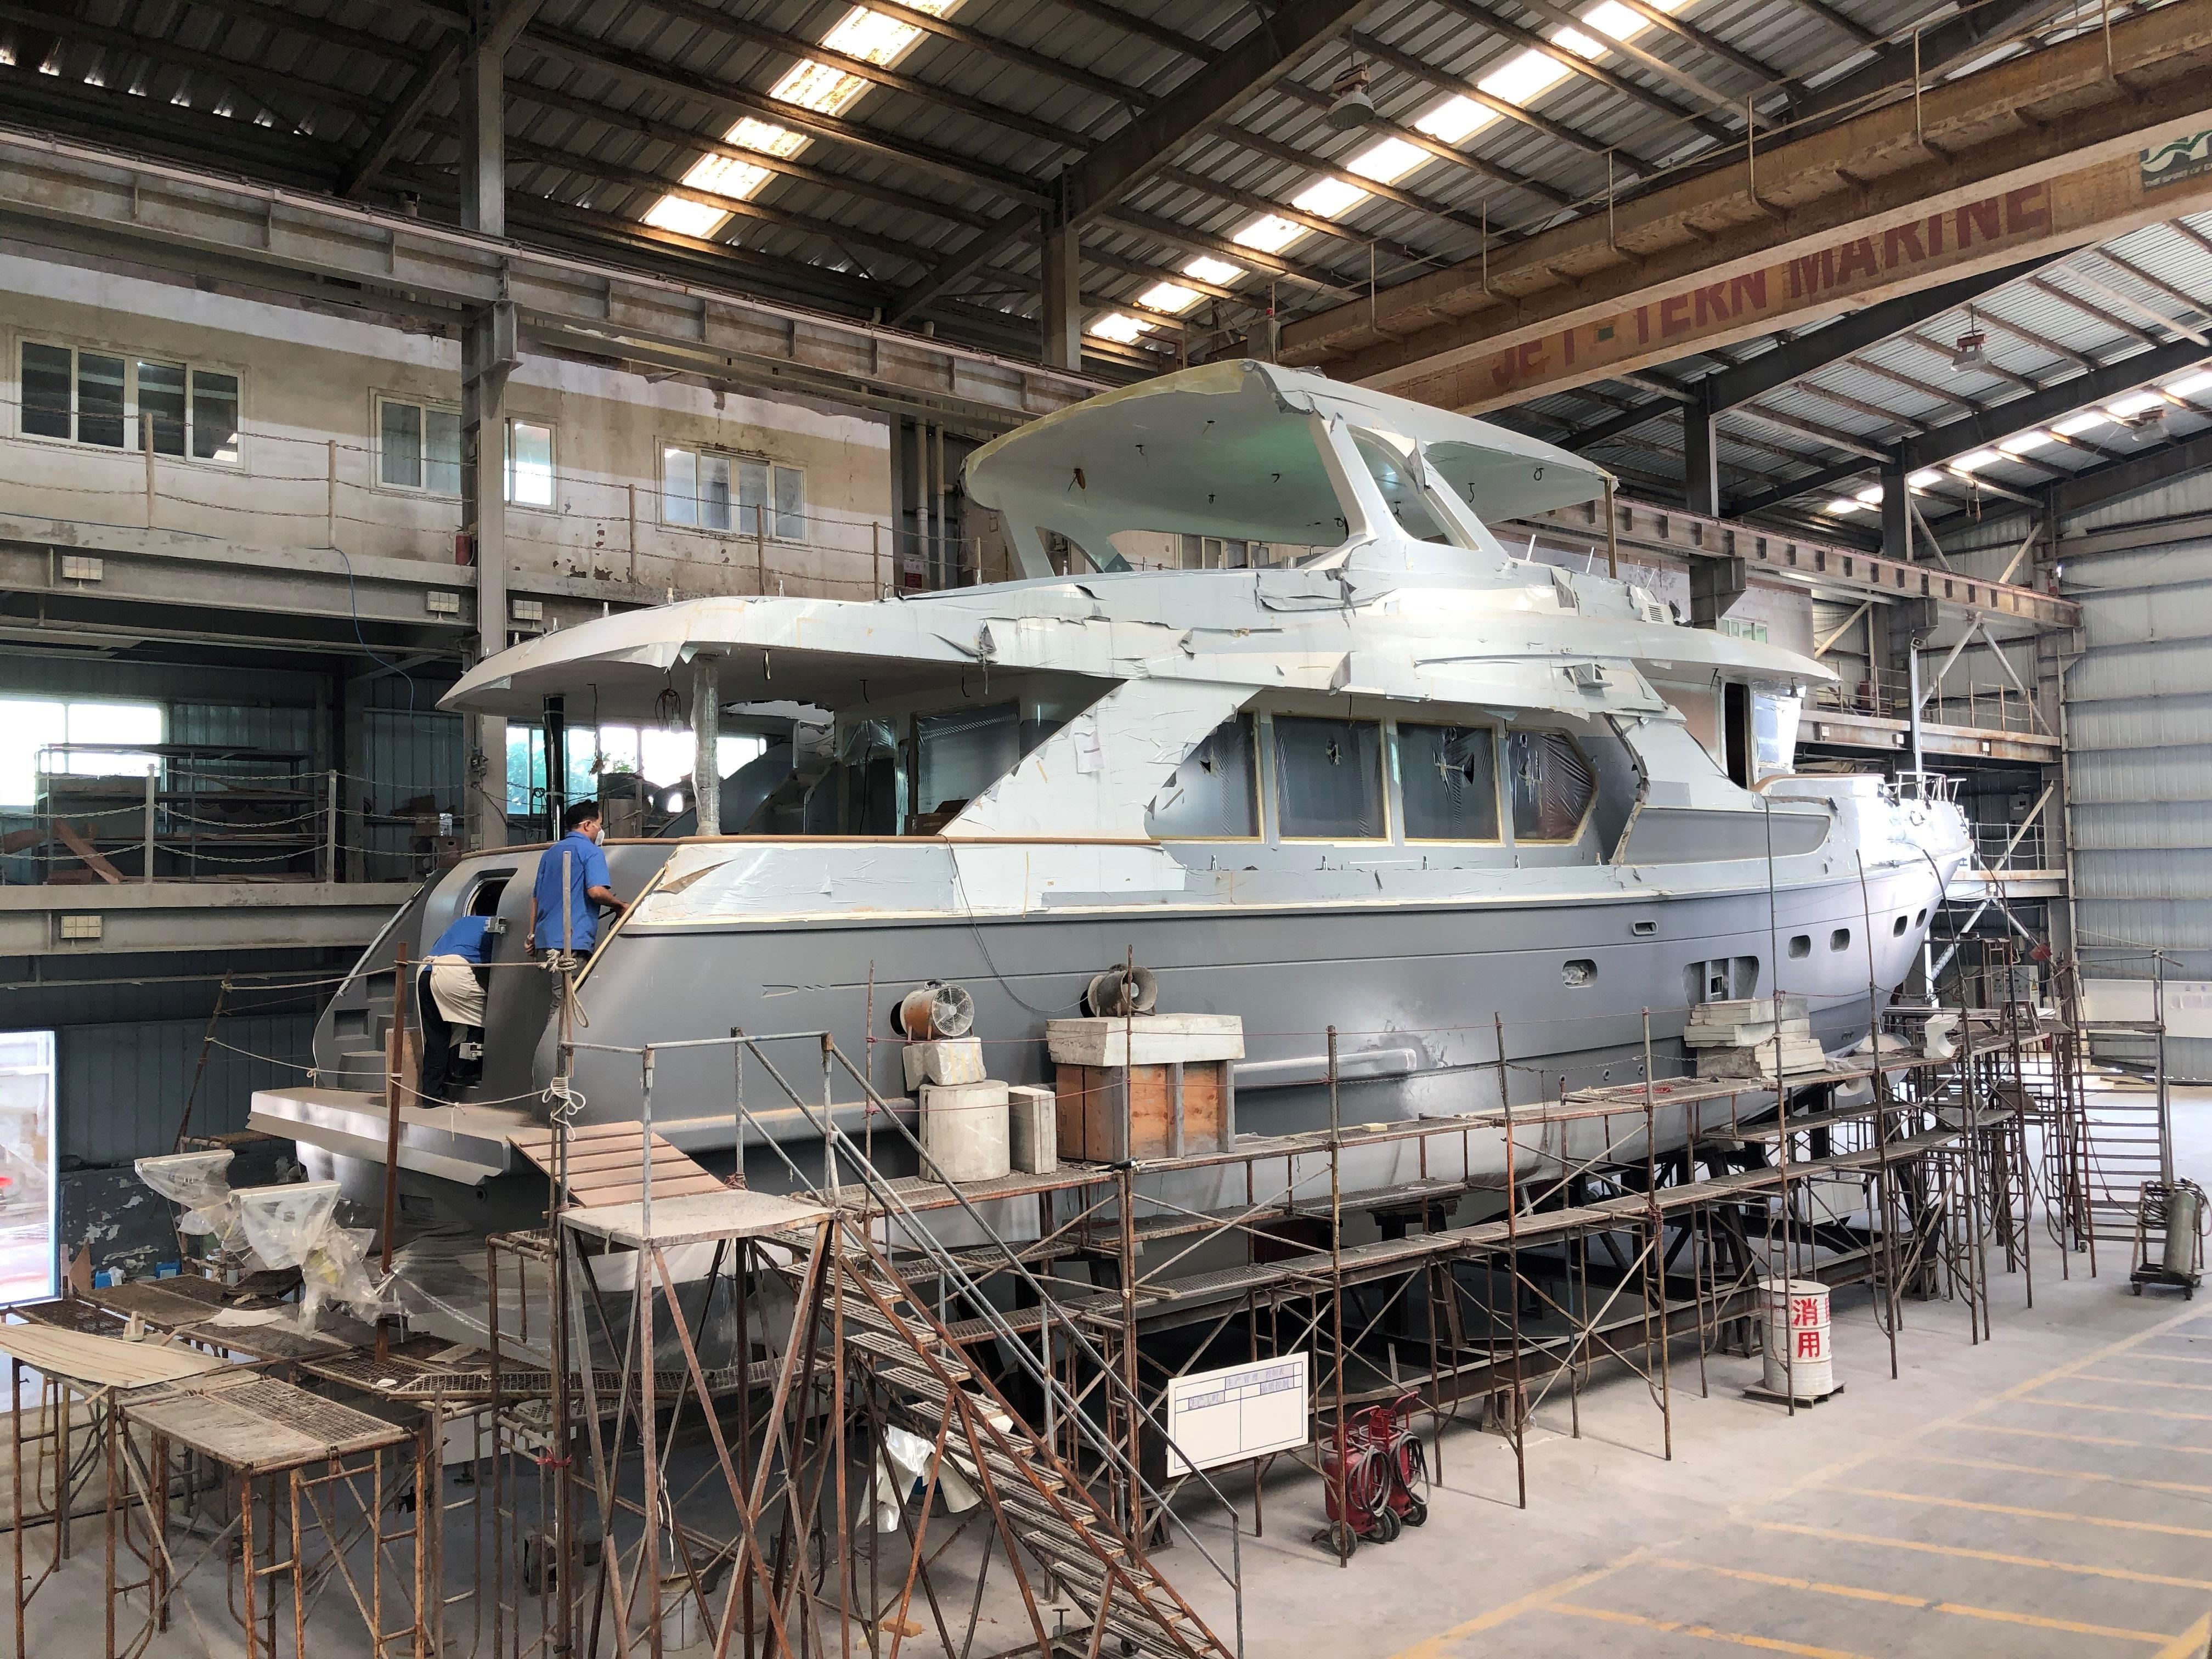 Selene 72 au chantier naval - Trawlers & Yachting